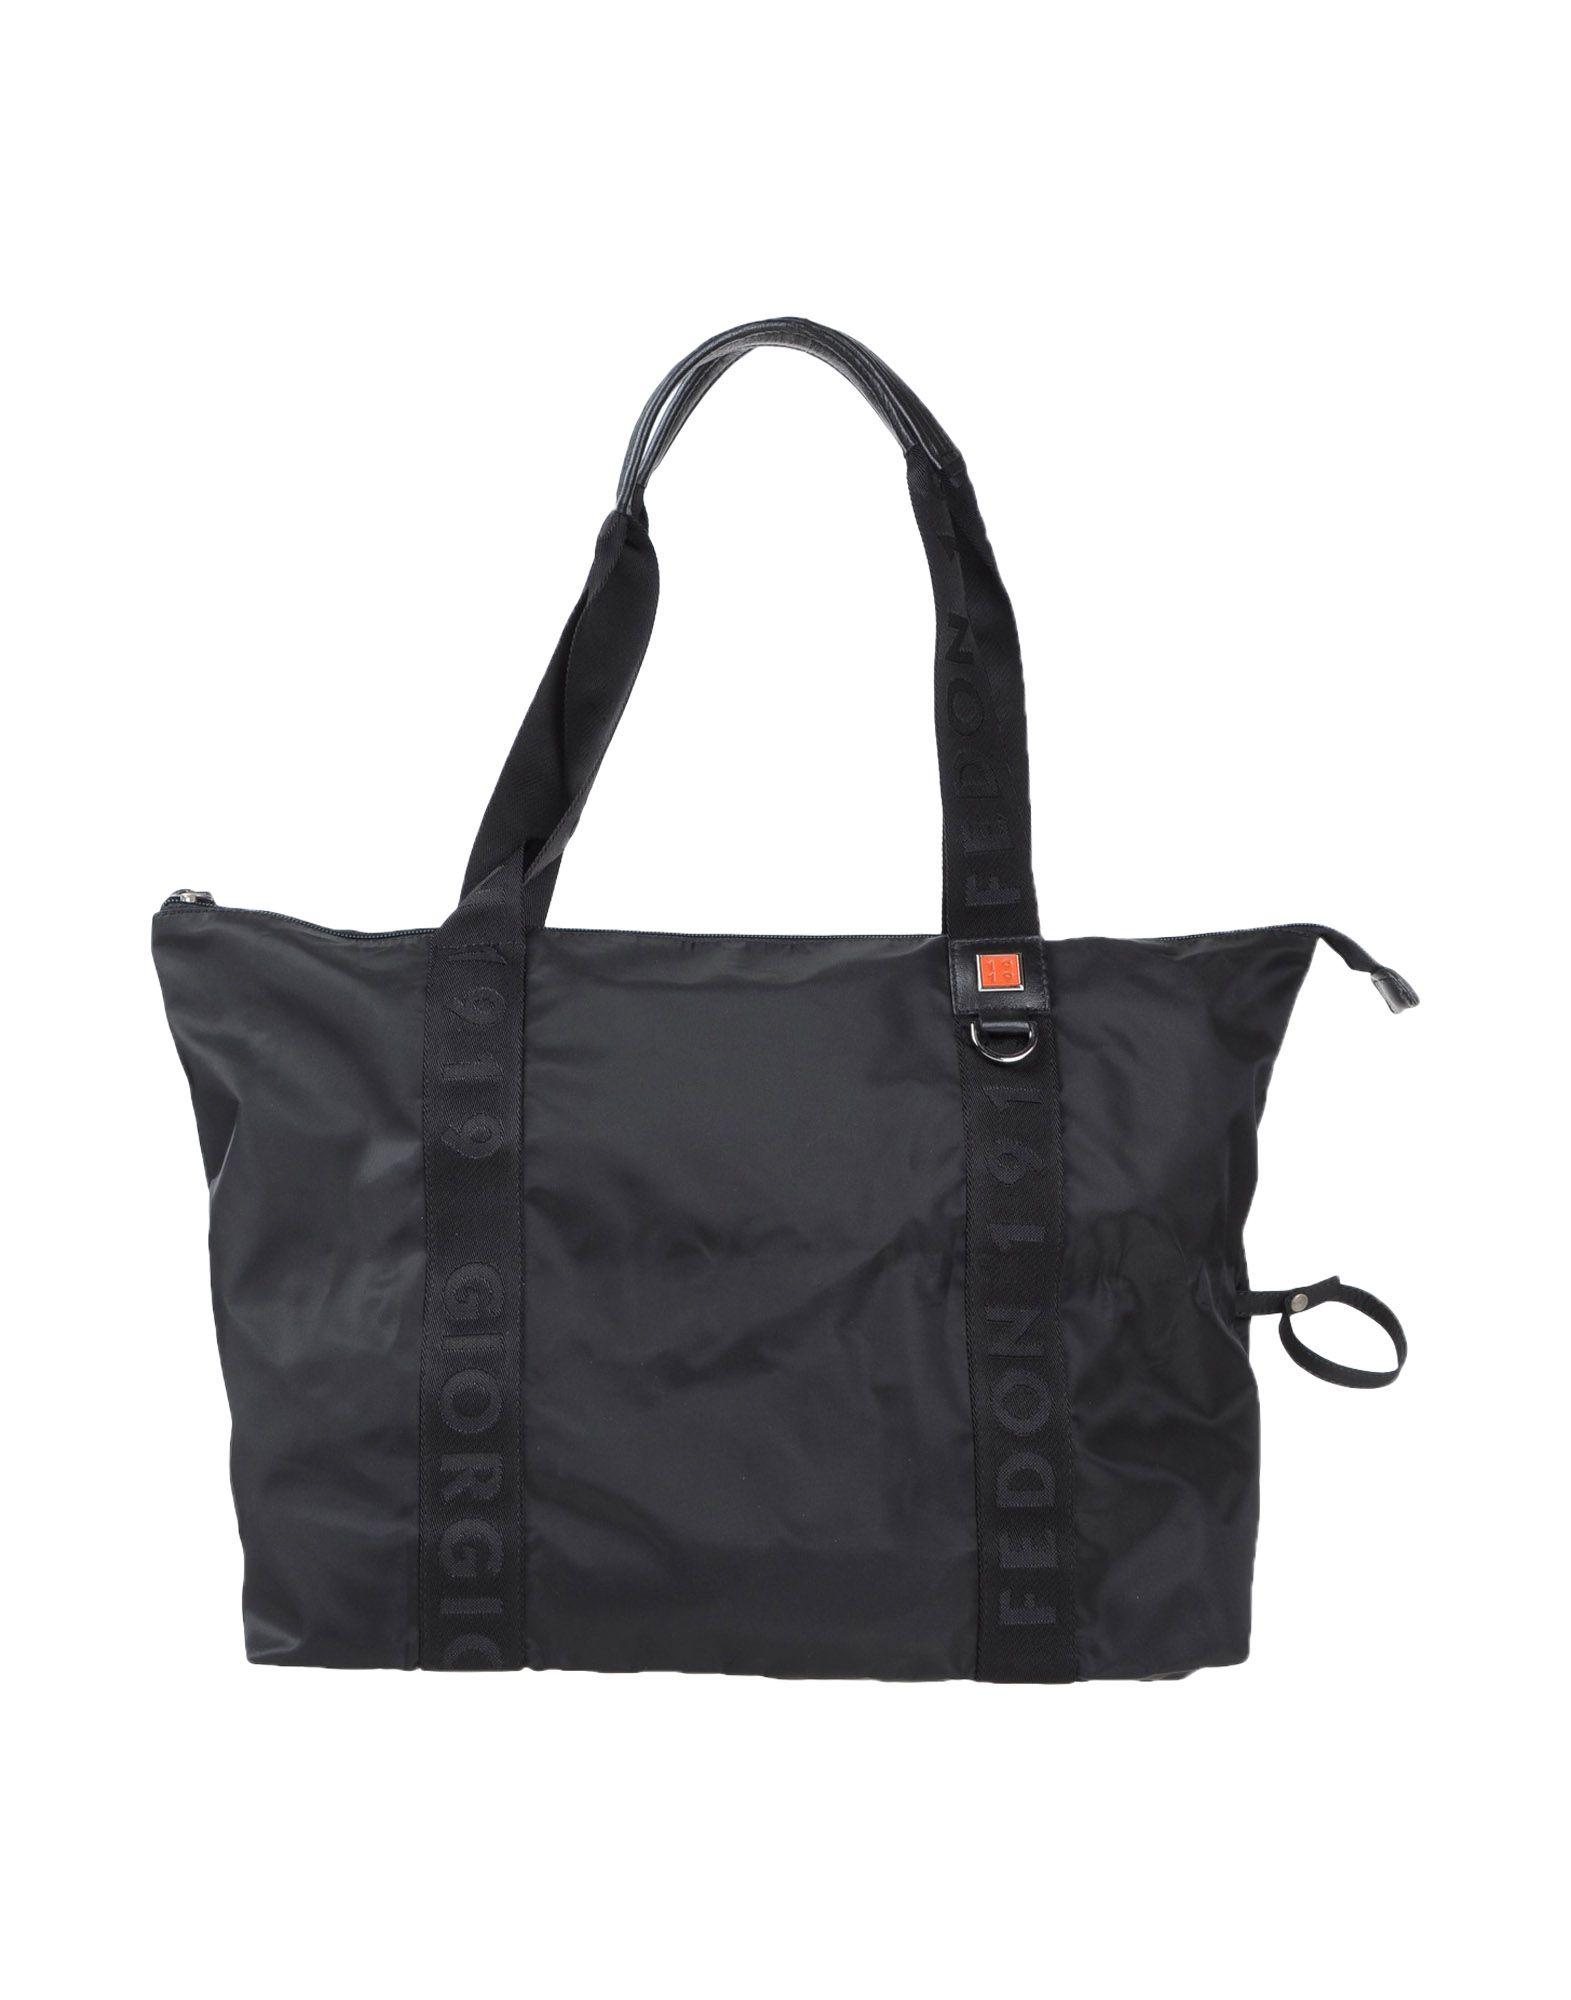 Giorgio fedon Handbag in Black